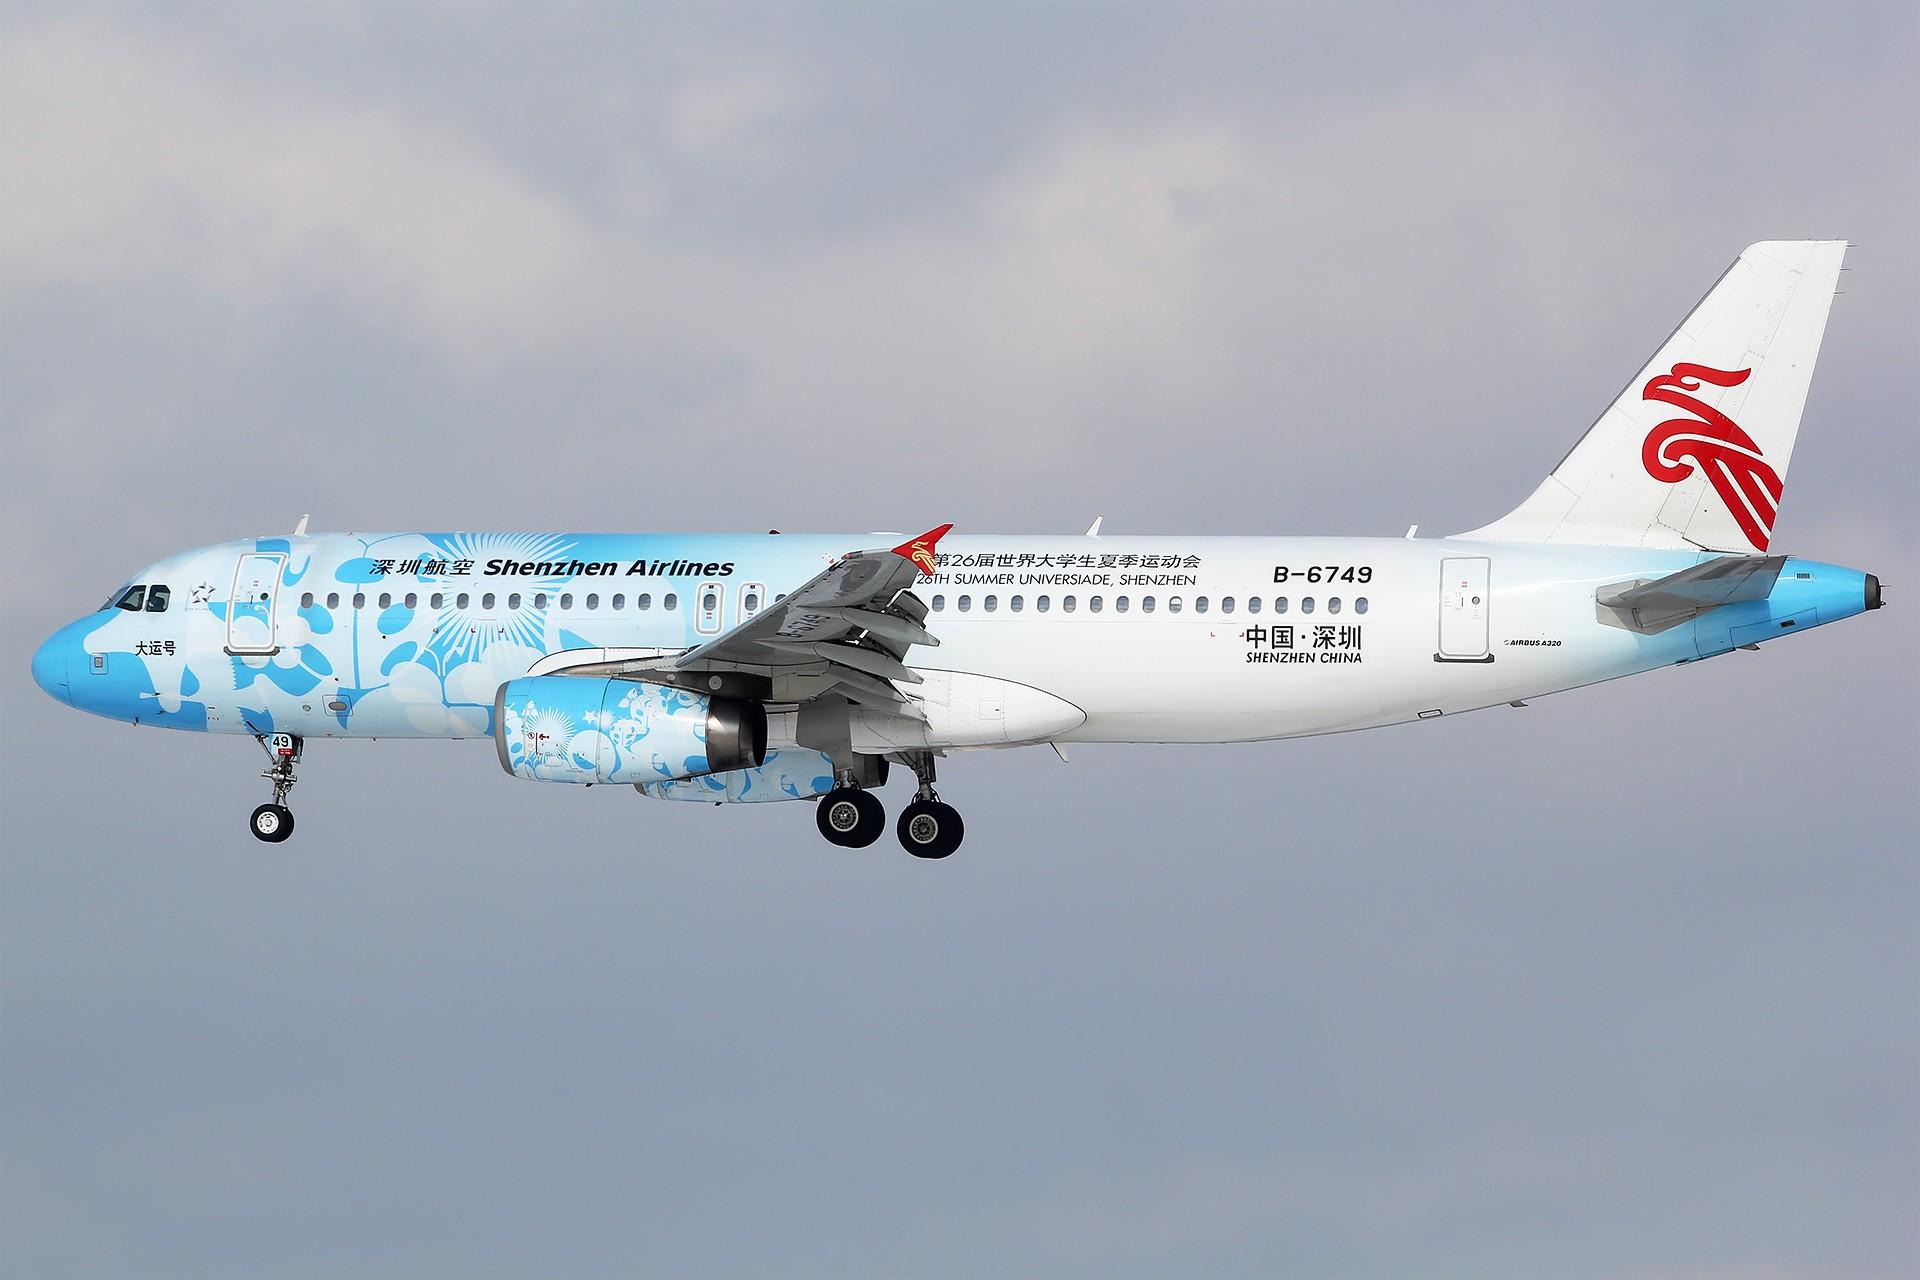 Re:[原创][原创][DLC]。。。DLC雪。。。 AIRBUS A320-200 B-6749 中国大连国际机场